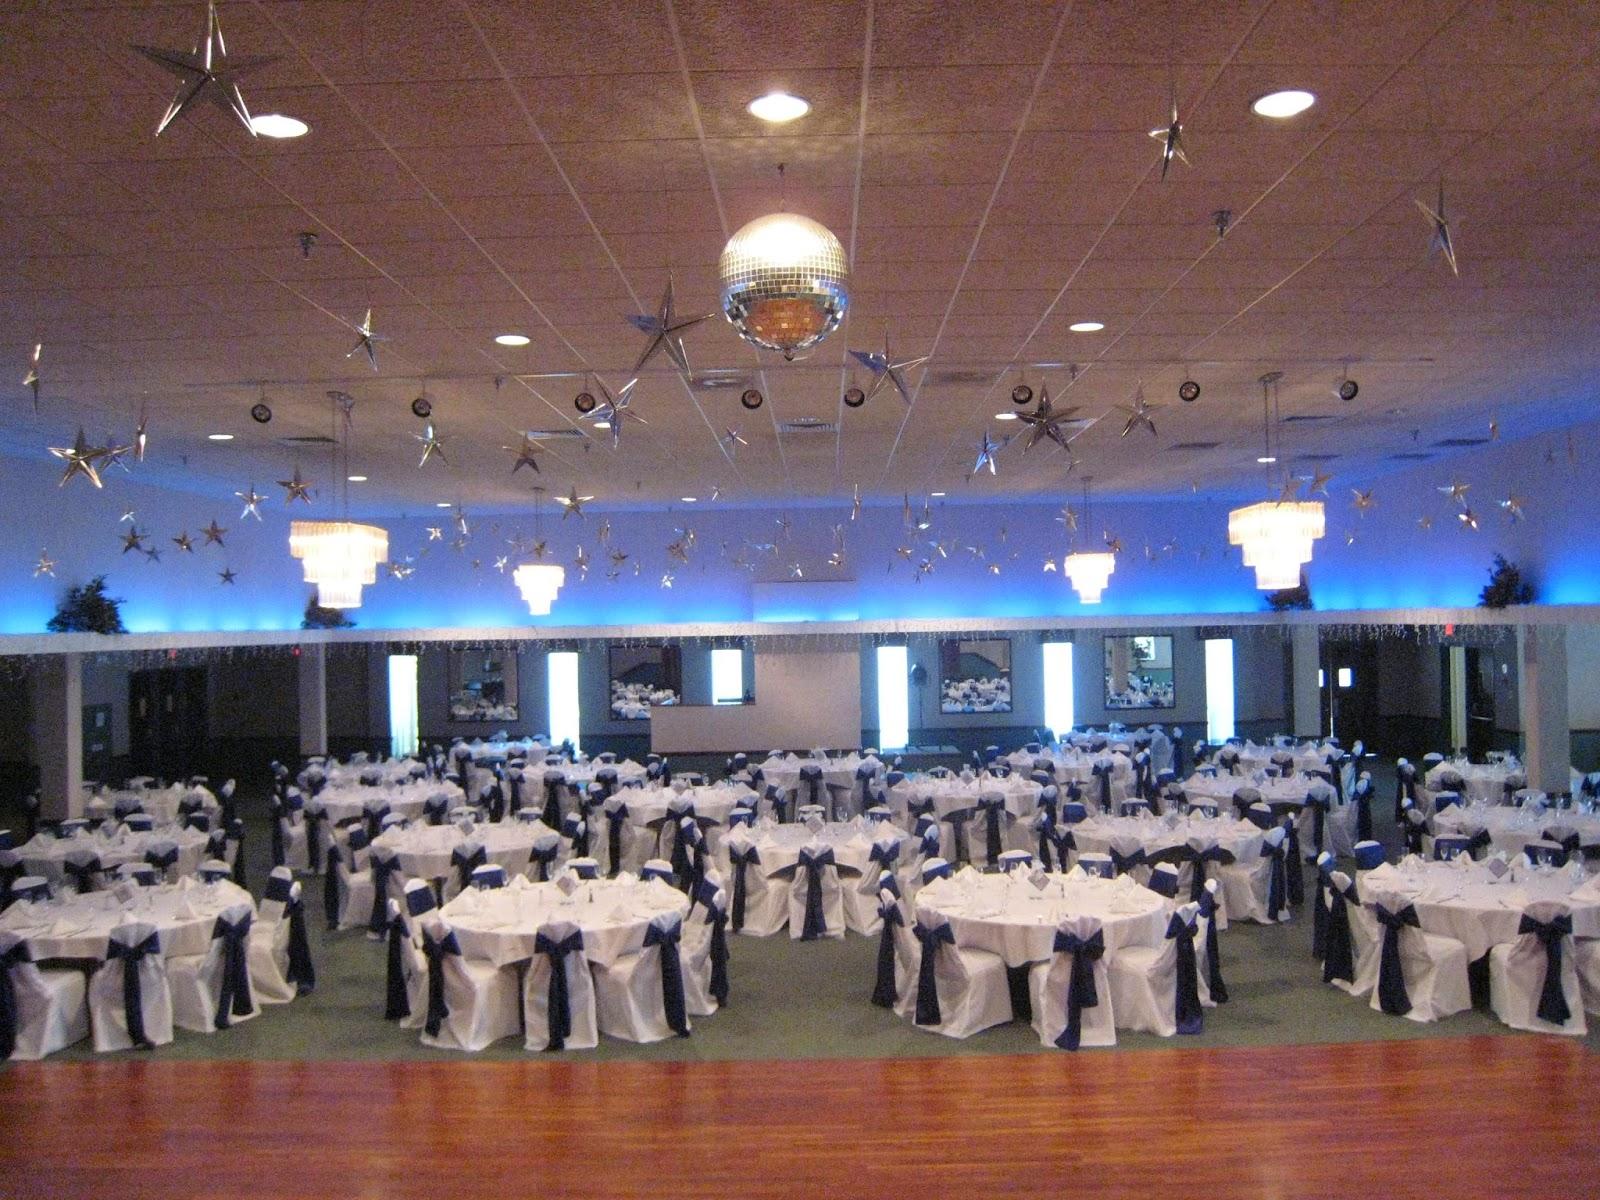 club chair covers bean bag with ottoman st louis wedding liaison blog: venue :: moolah and oasis ballroom